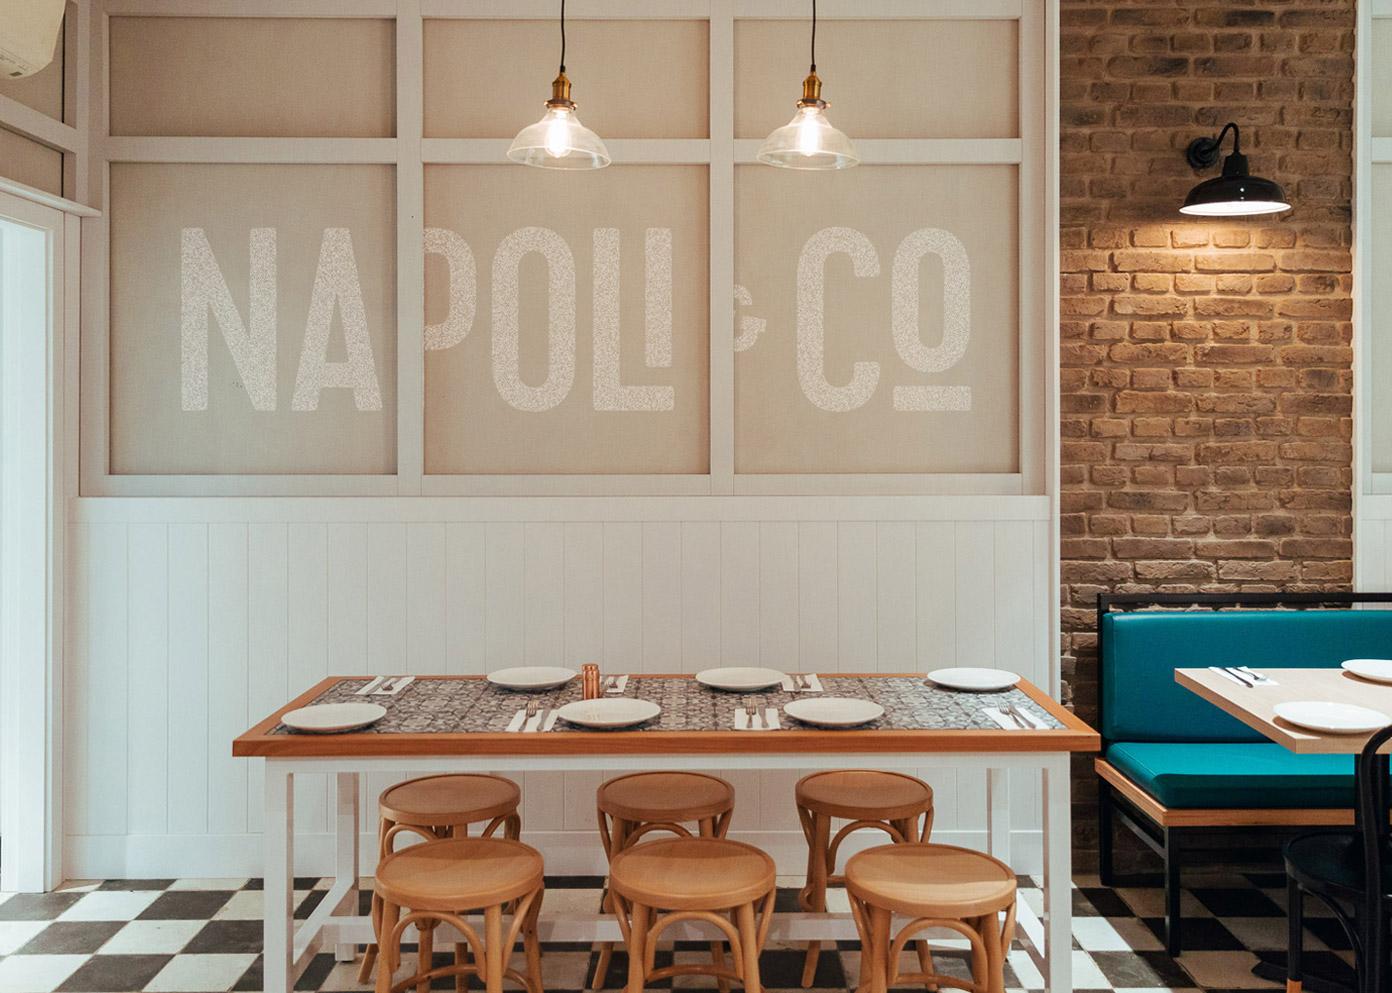 Napoli & Co.